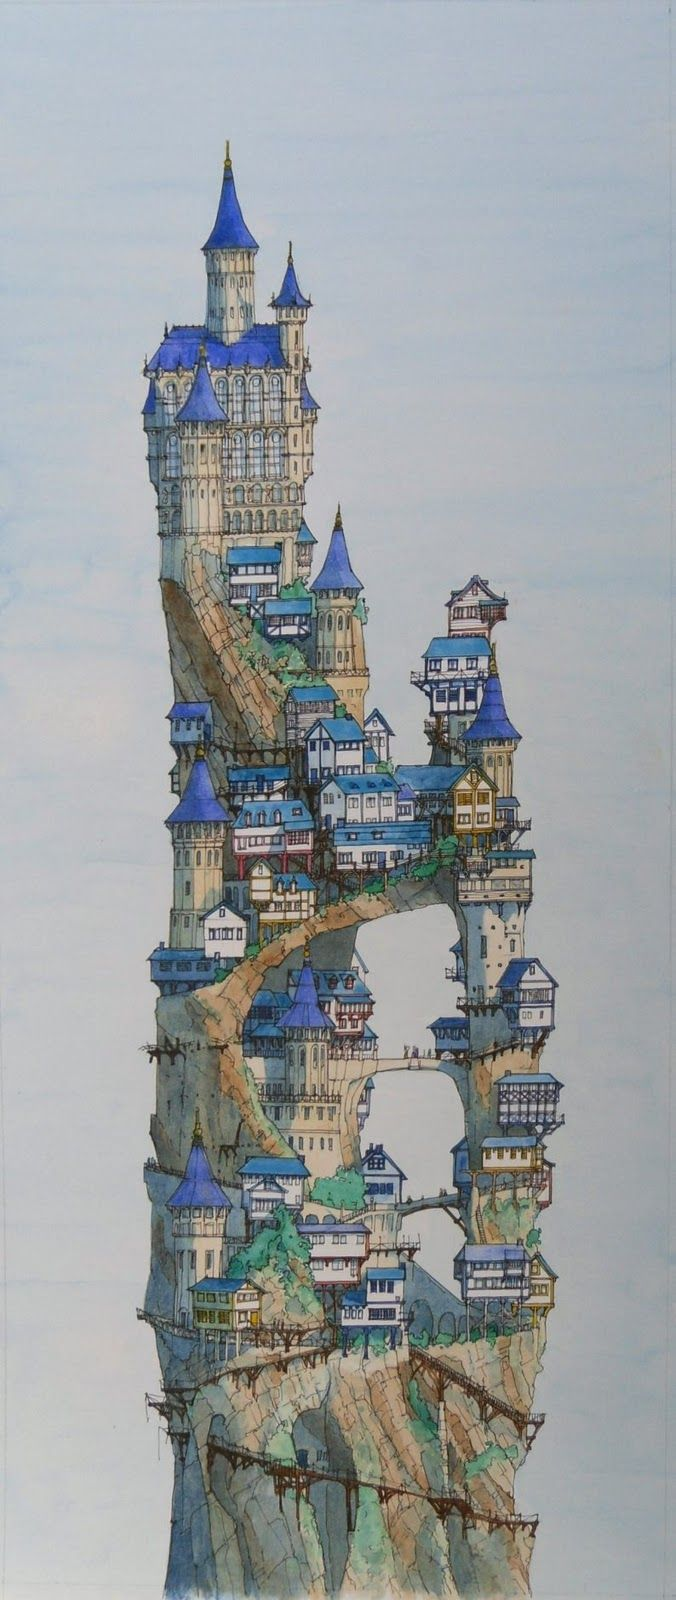 best 20+ minecraft castle ideas on pinterest | minecraft castle